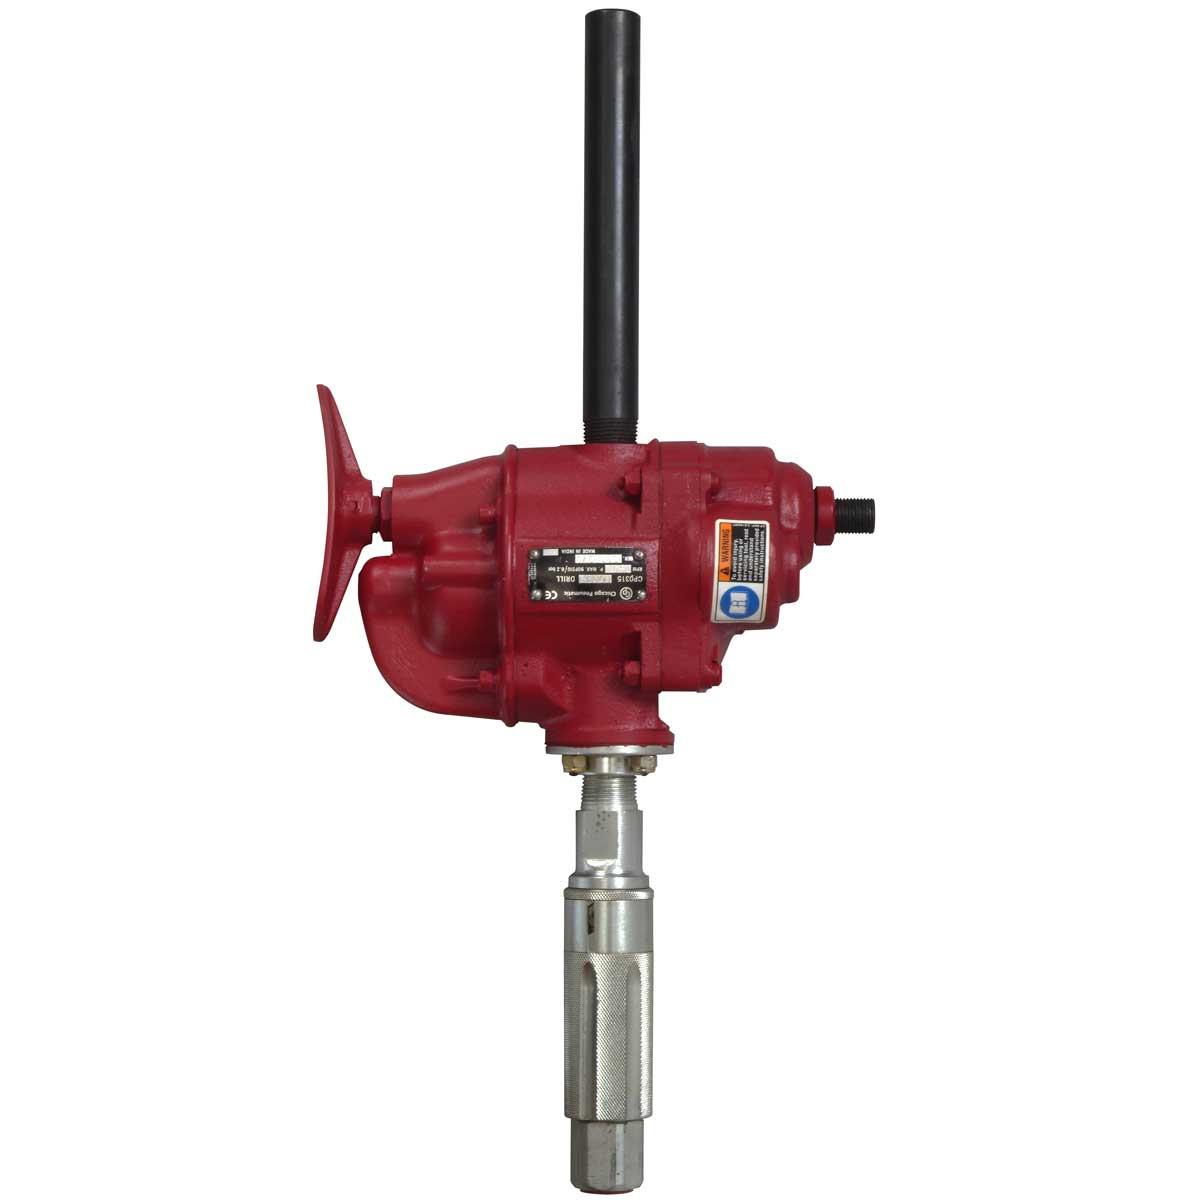 CP0315 Chicago Pneumatic Core Drill